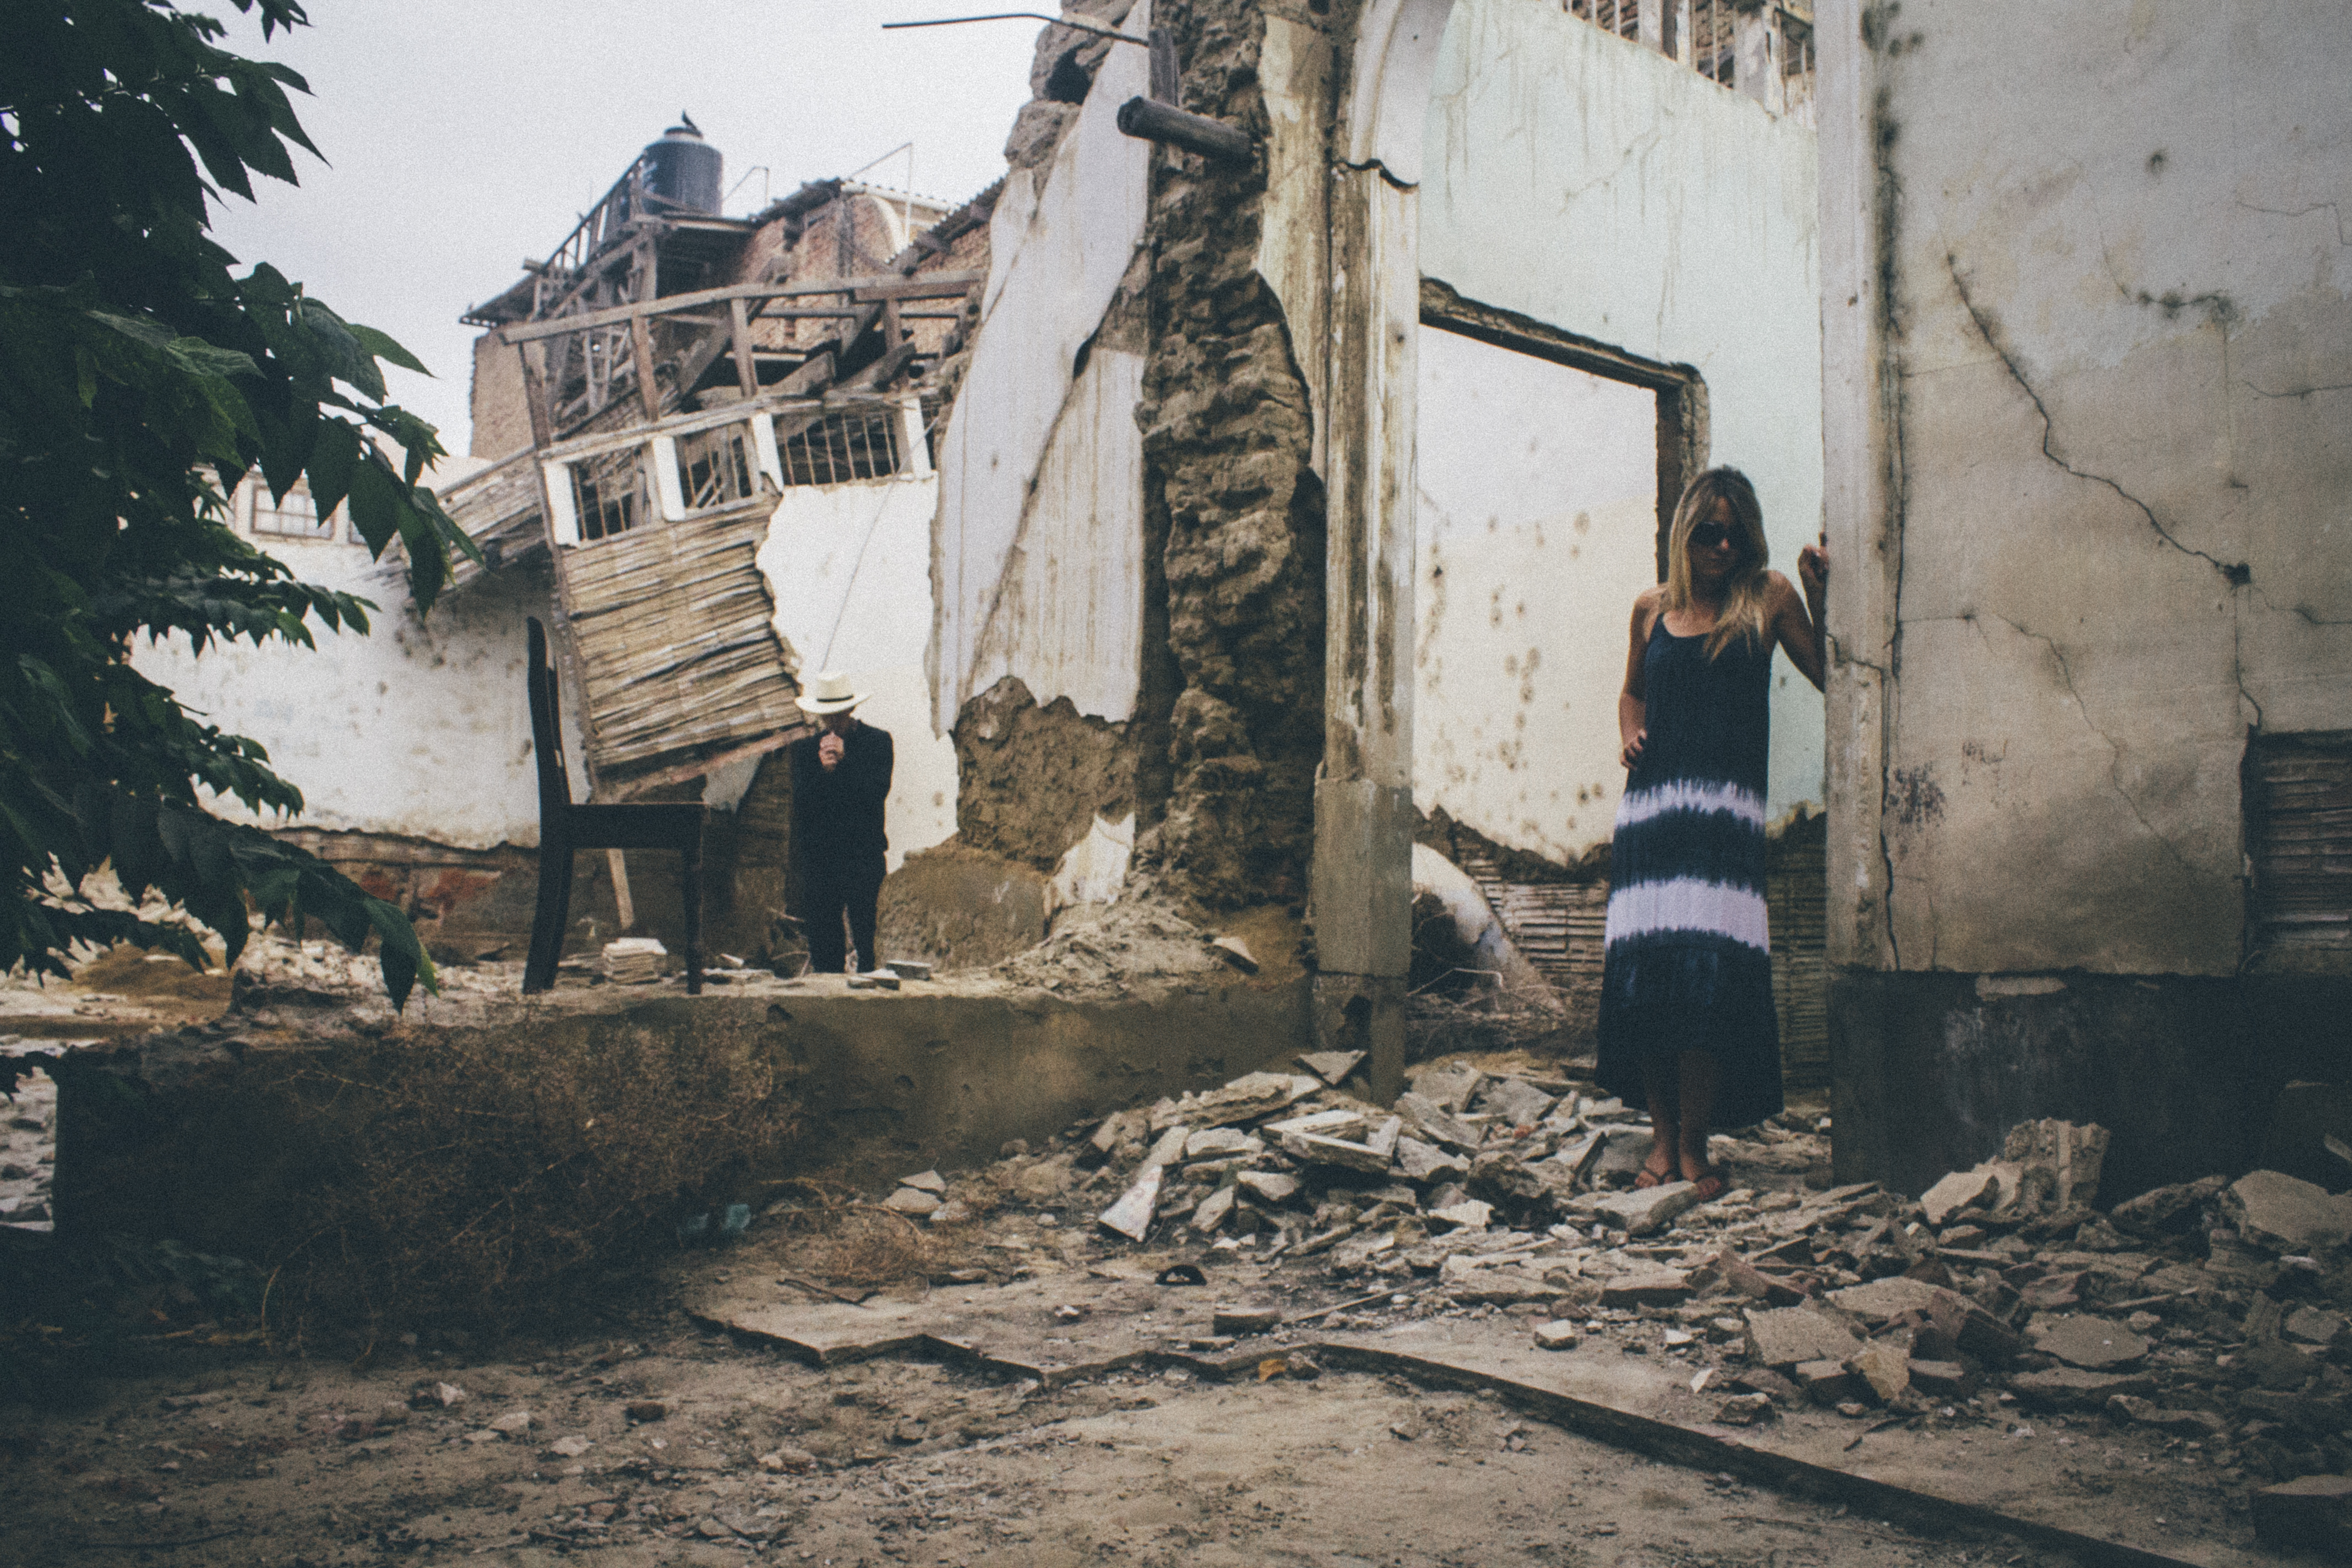 MelissaMontoyaPhotography_2015_10_20_Peru_PIURA_06